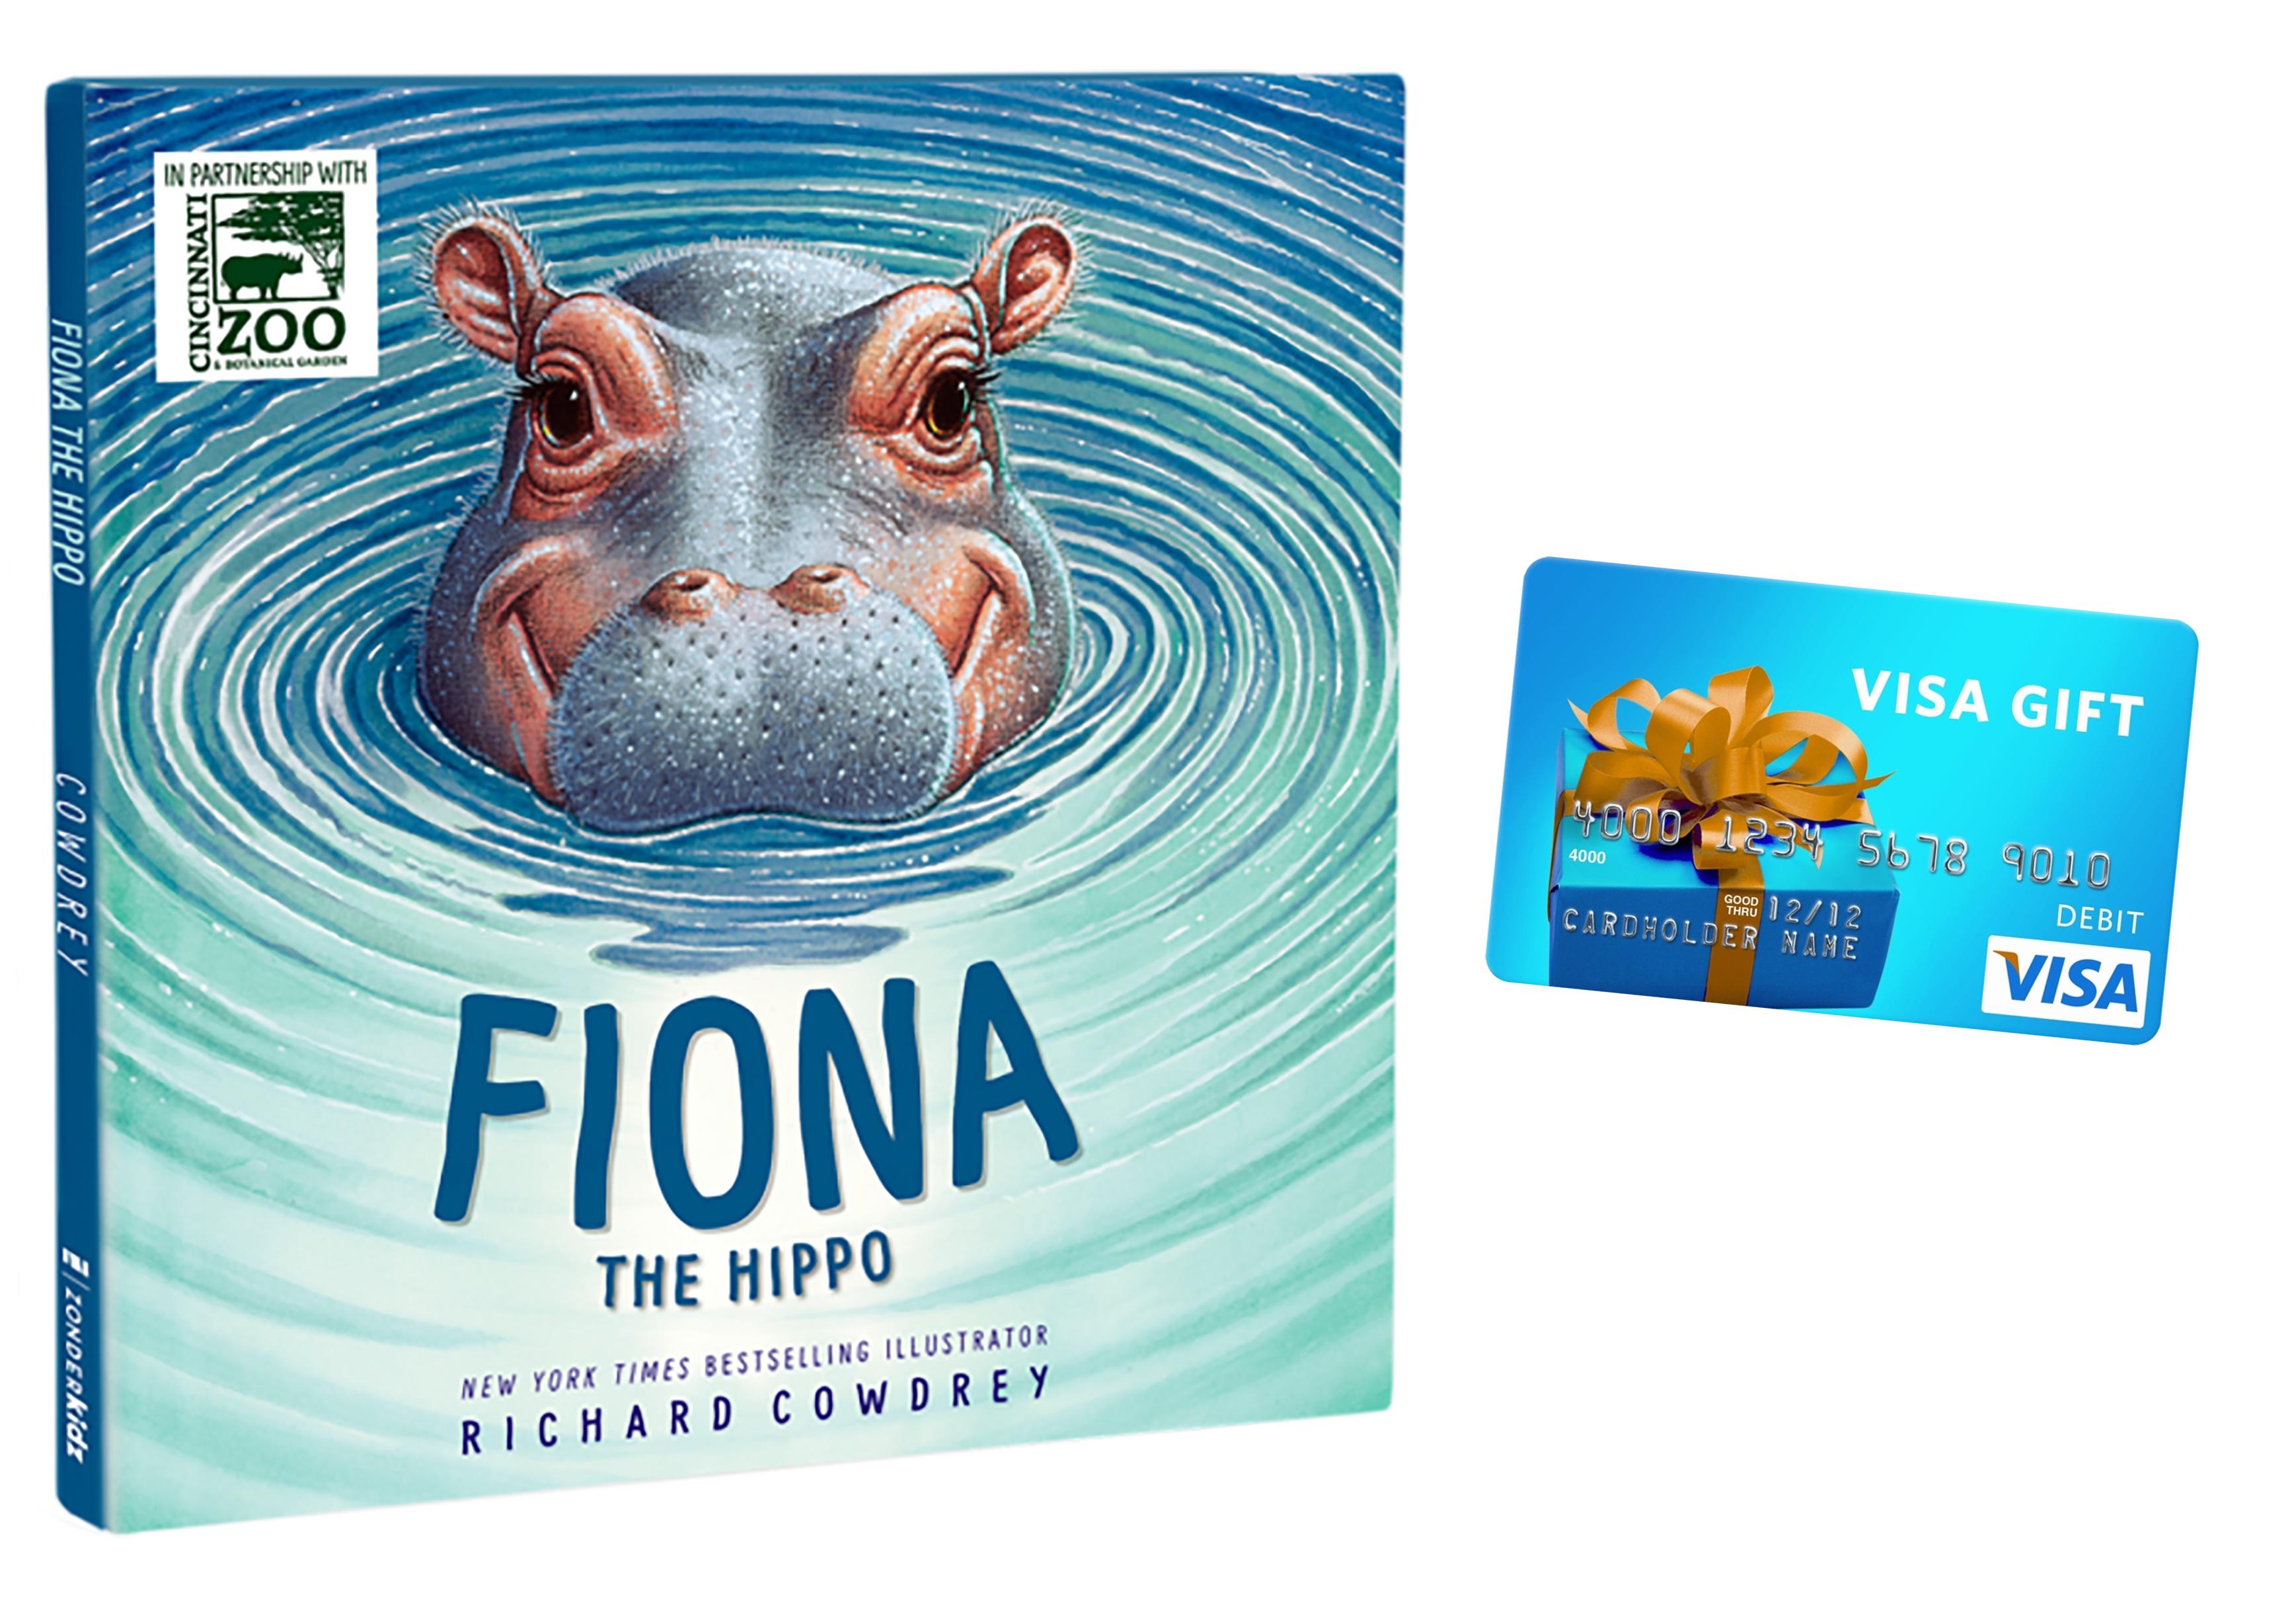 celebrate-picture-books-picture-book-review-Fiona-the-Hippo_Fabulous-Fiona-Prize